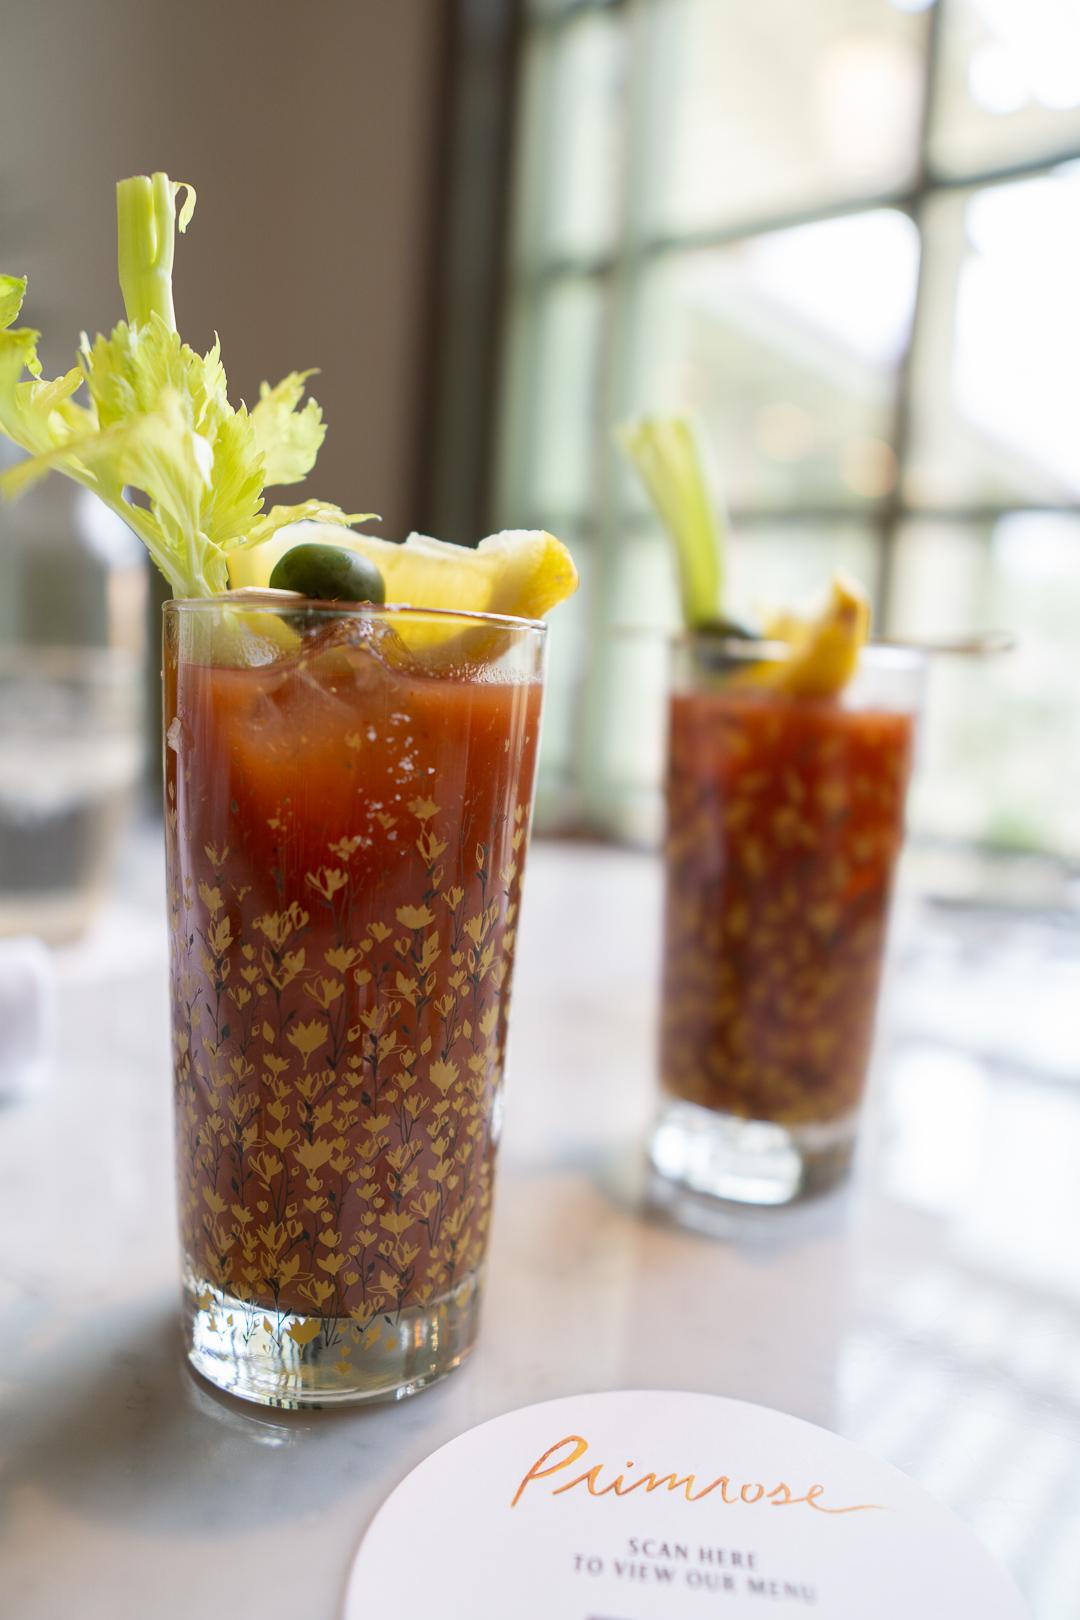 Primrose Bloody Marys